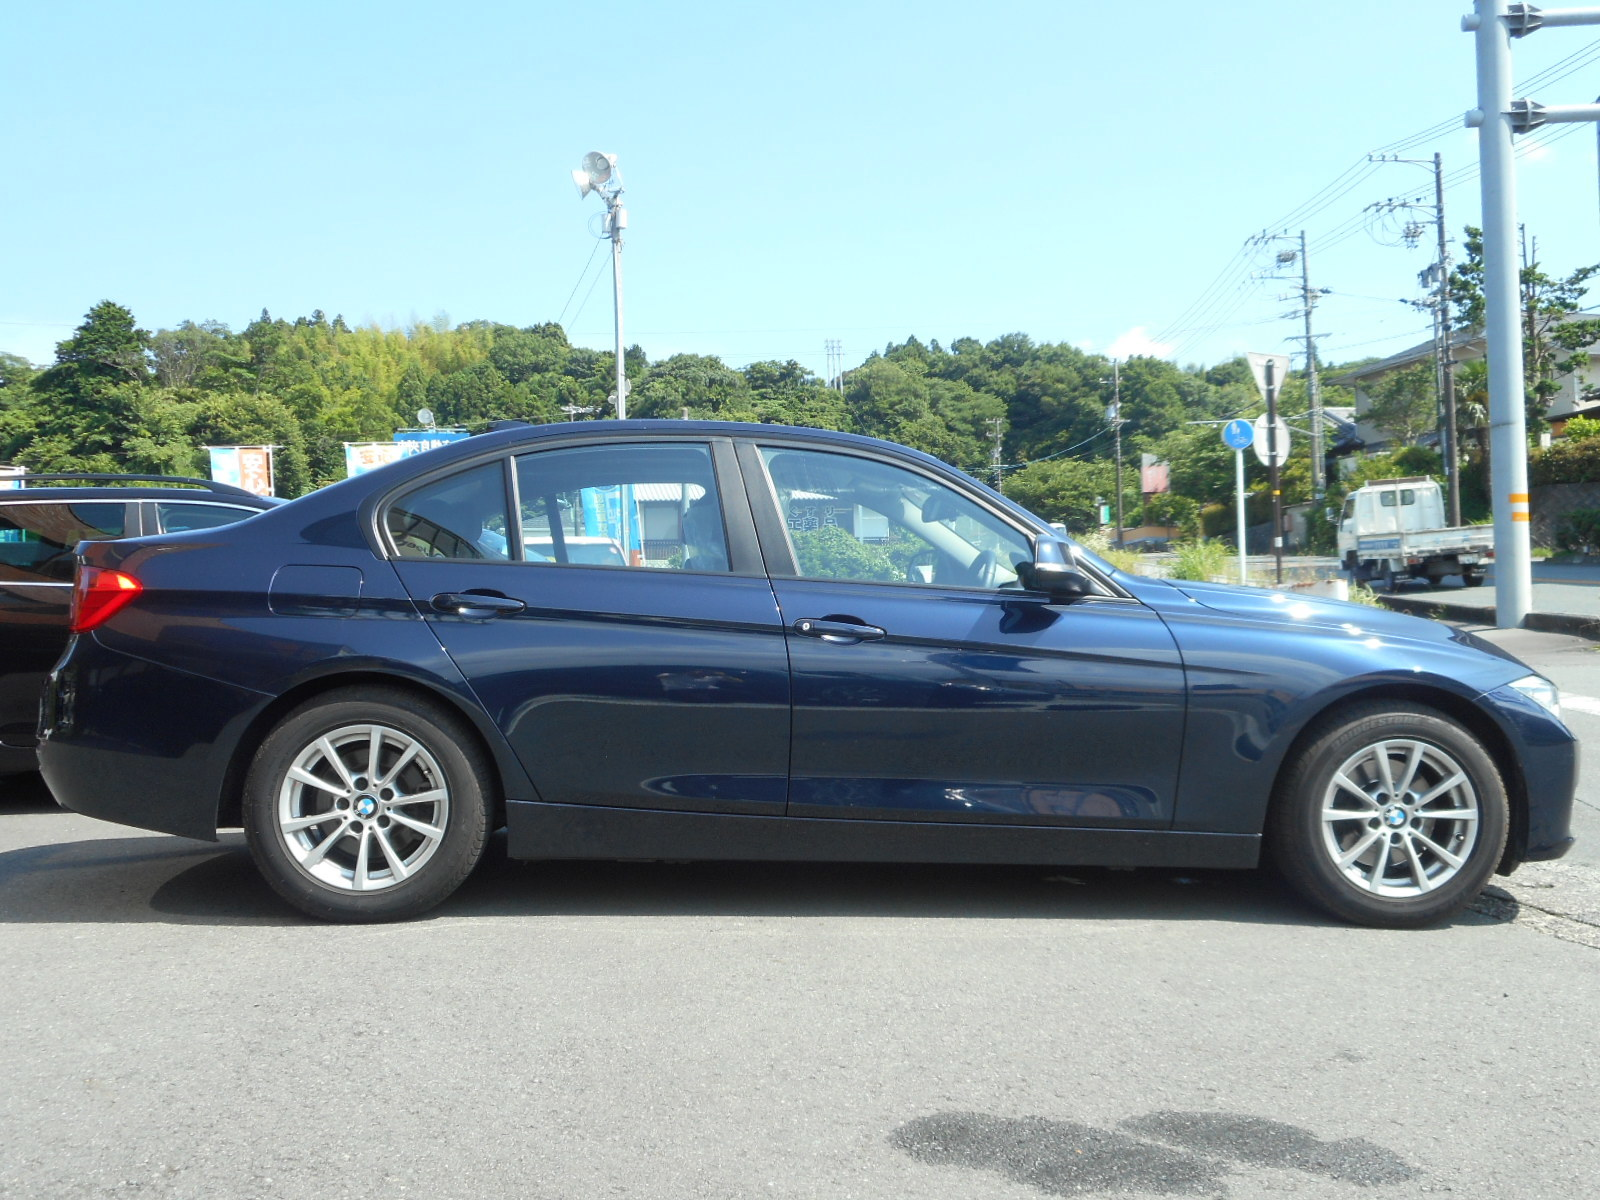 BMW 320d入りました!_c0267693_17525600.jpg